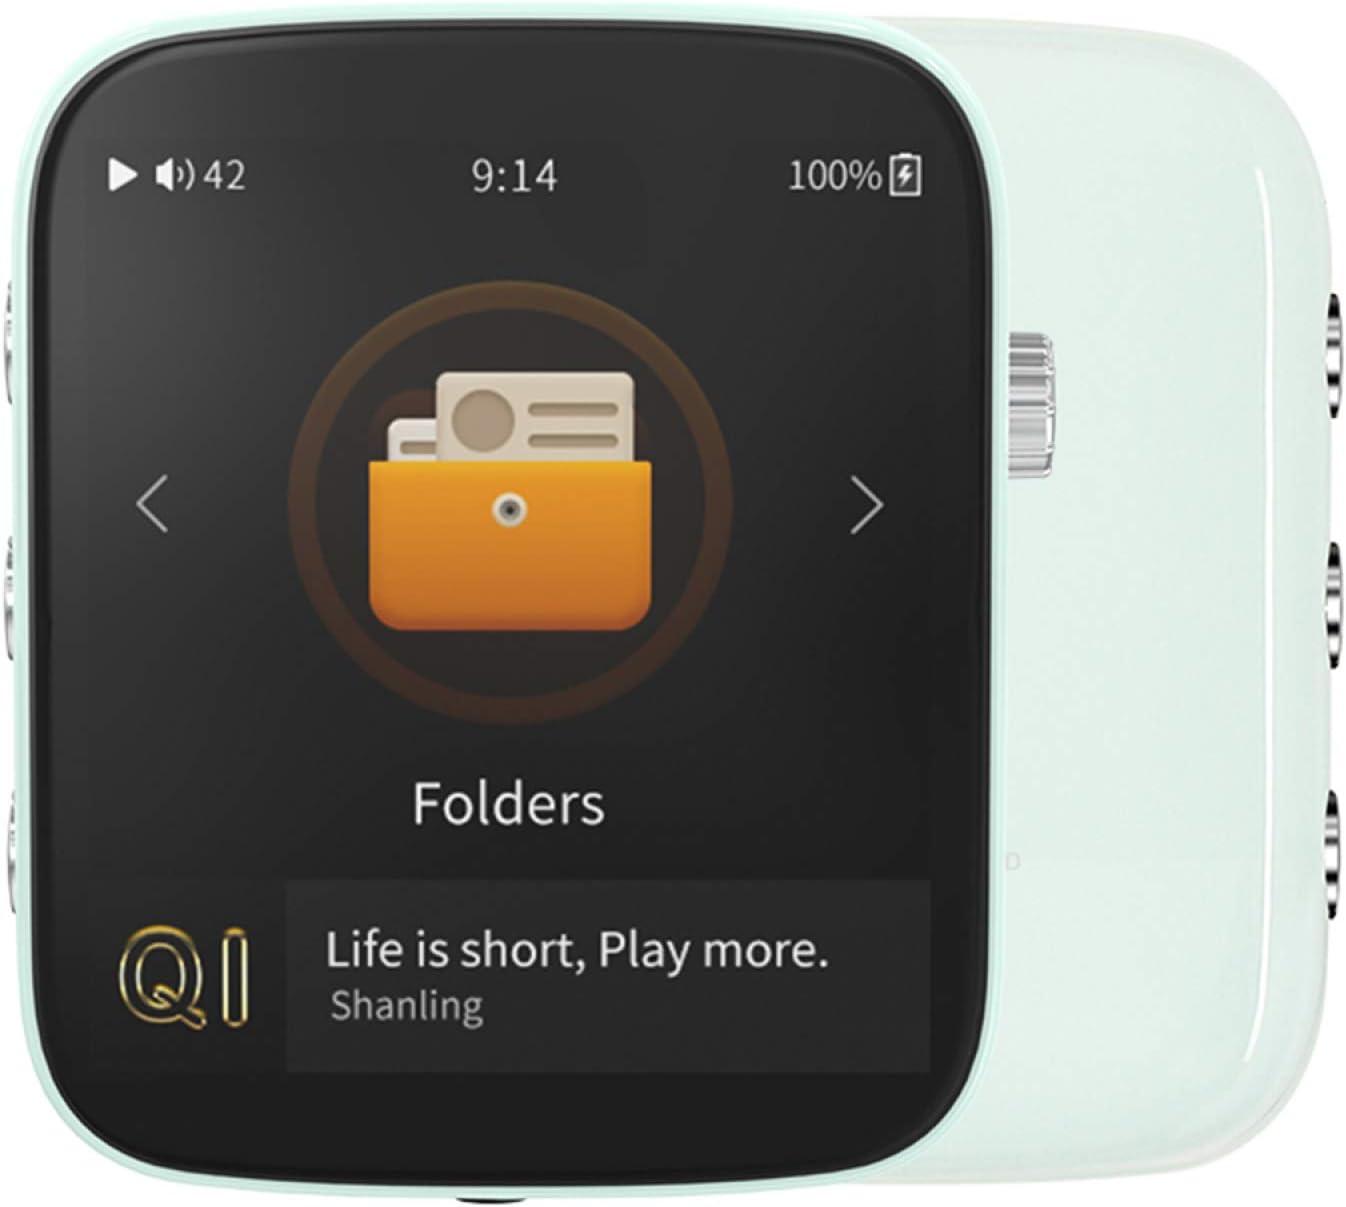 YaGFeng Shanling Q1 Reproductor de MP3 HiFi con Bluetooth Sin Pérdidas DSD Reproductor de Música de Audio Digital de Alta Resolución Reproductor de Audio Portátil de Alta Resolución,Blue